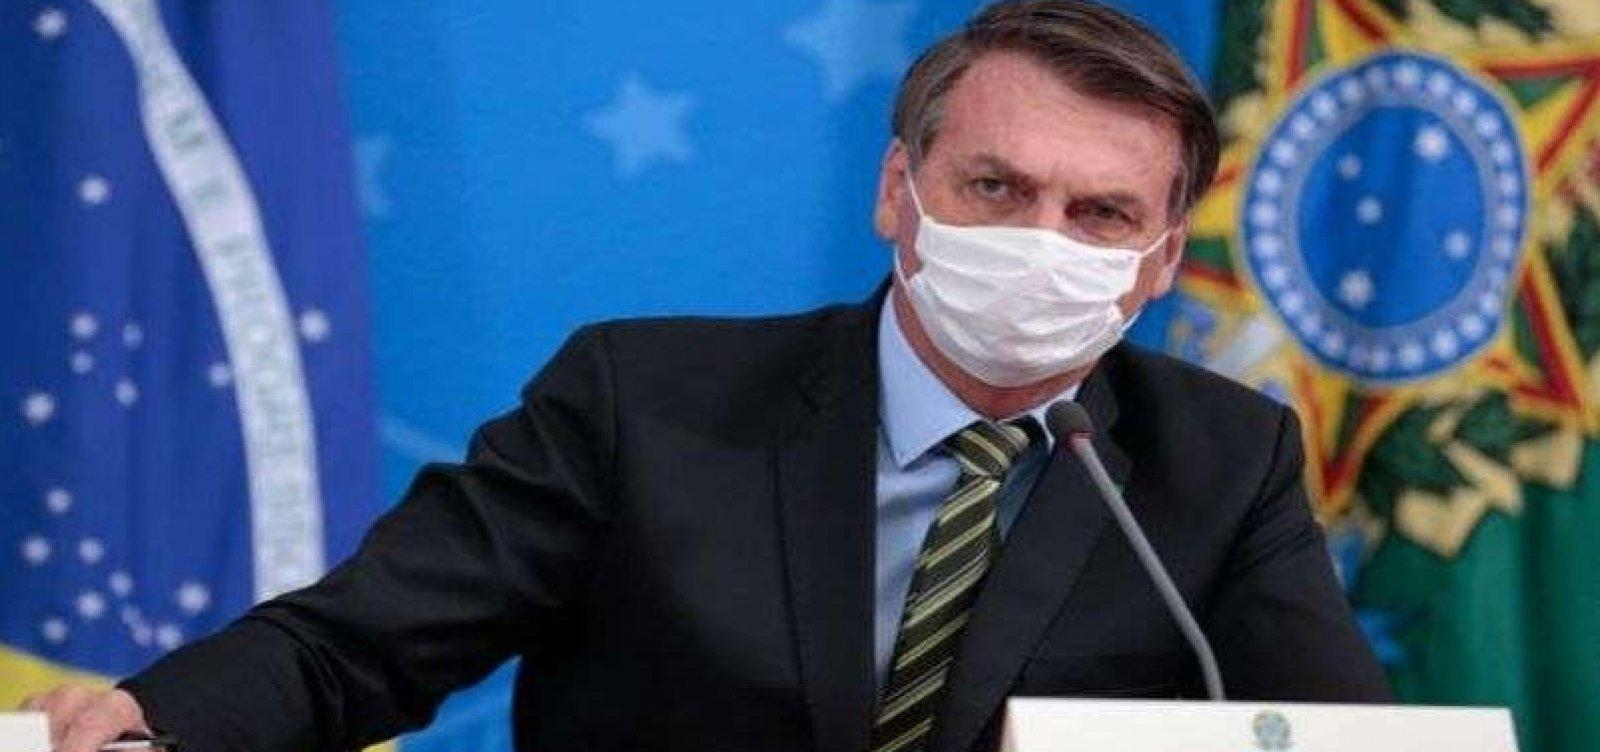 Bolsonaro diz que pandemia 'pode ser fabricada'